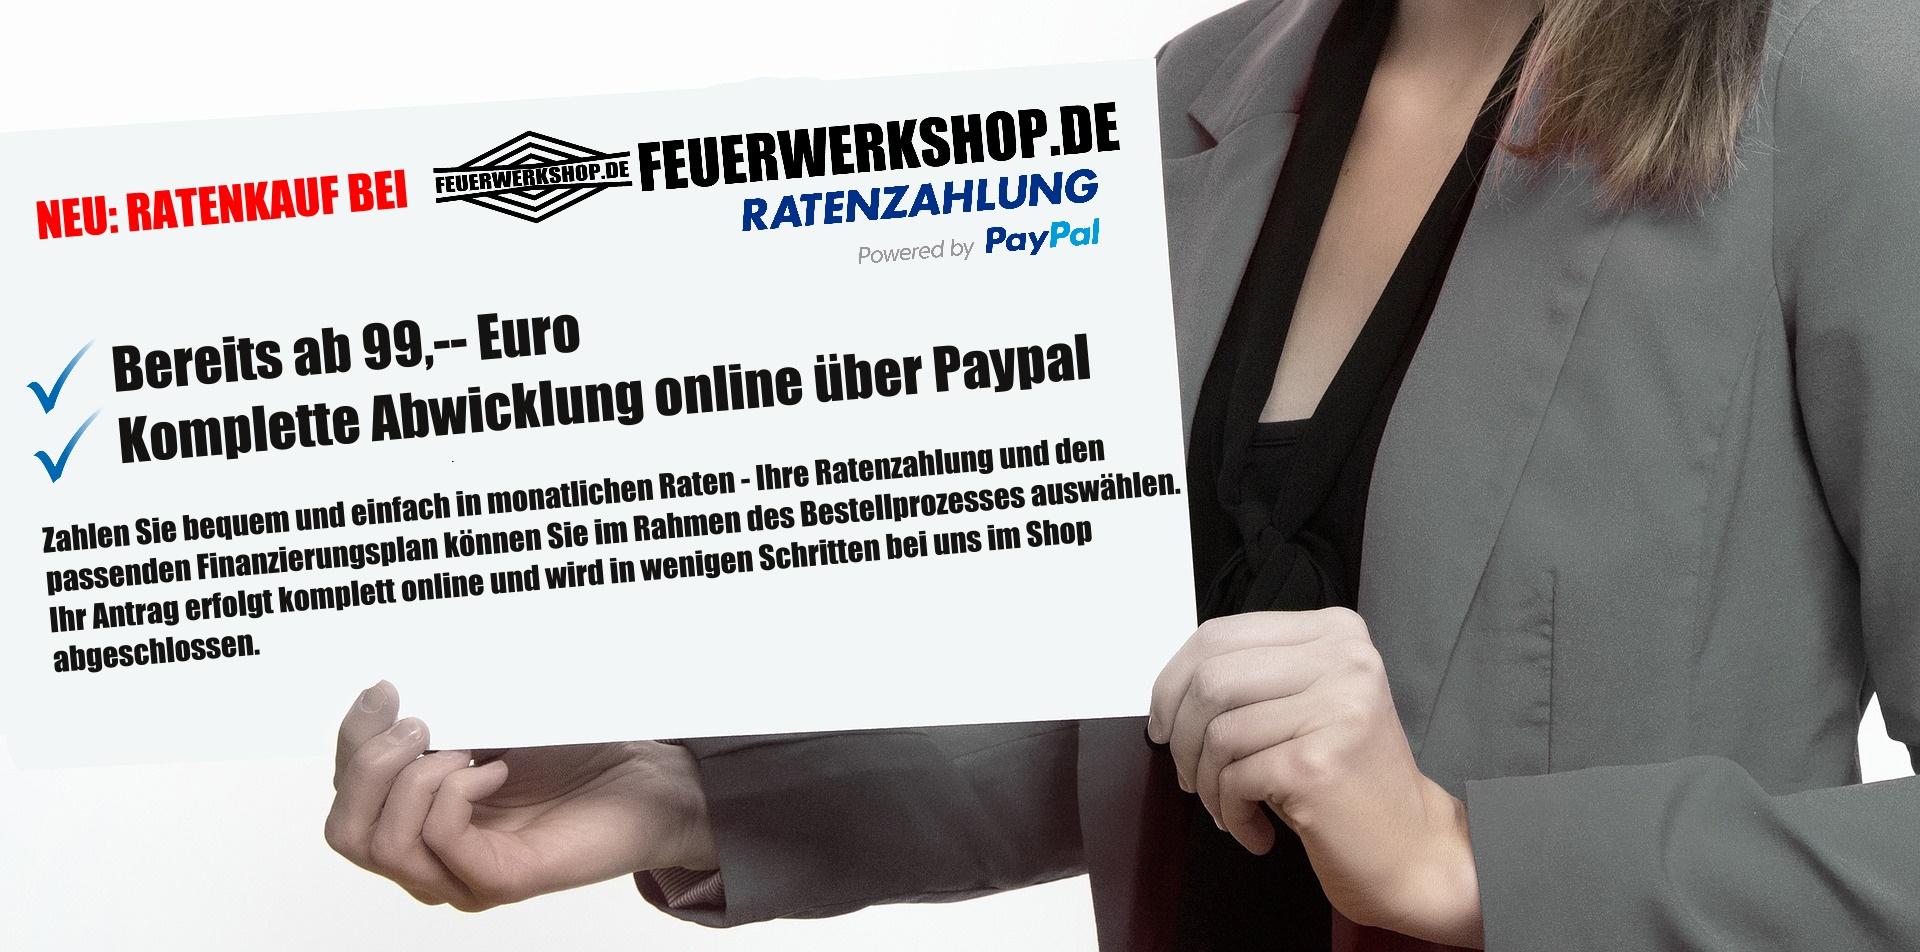 Ratenkauf bei feuerwerkshop.de